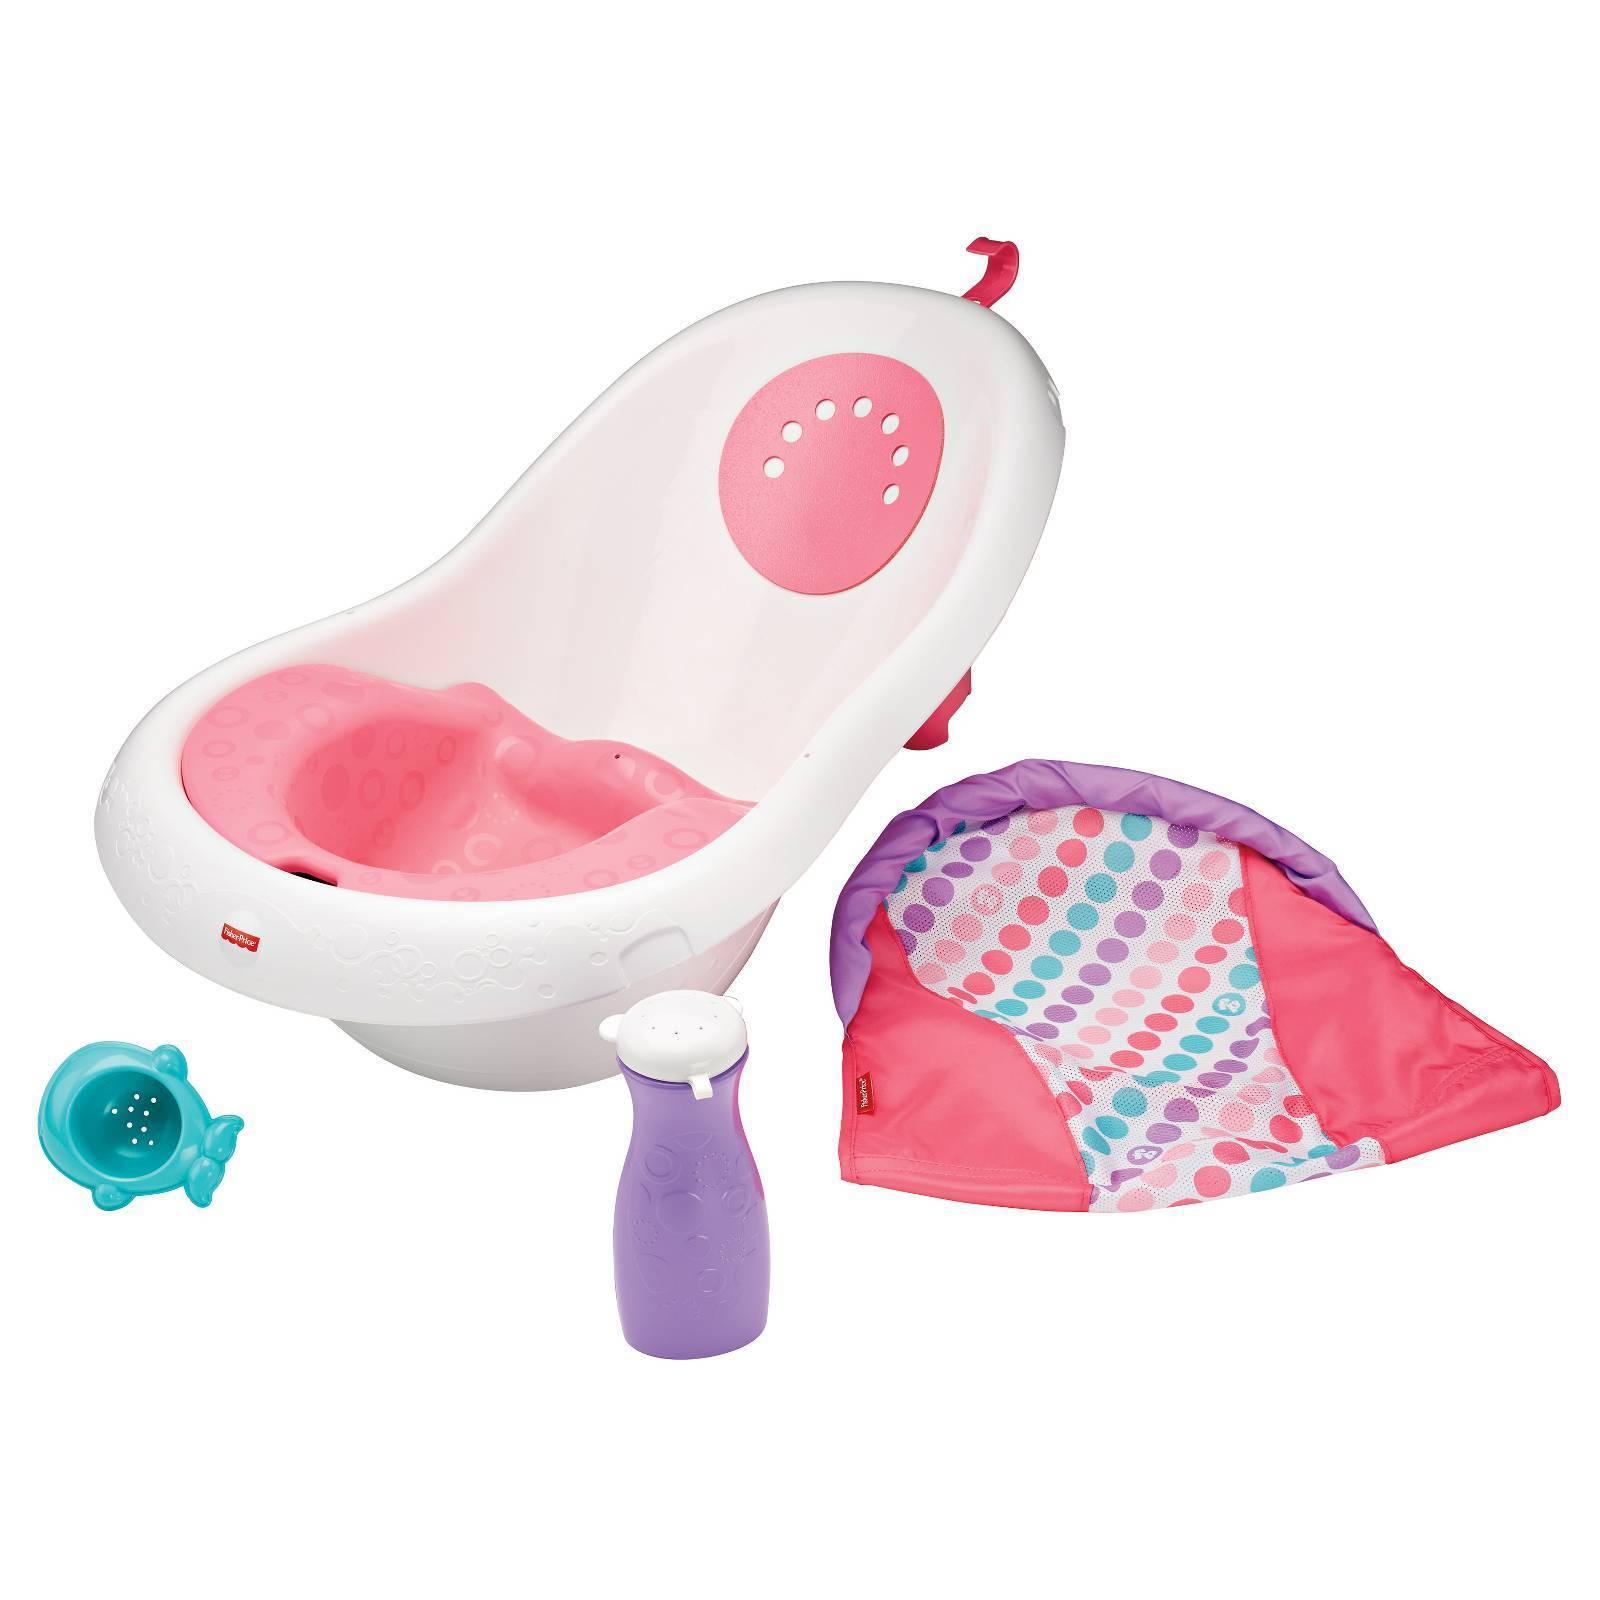 Fisher-Price 4-in-1 Sling \'n Seat Tub   eBay